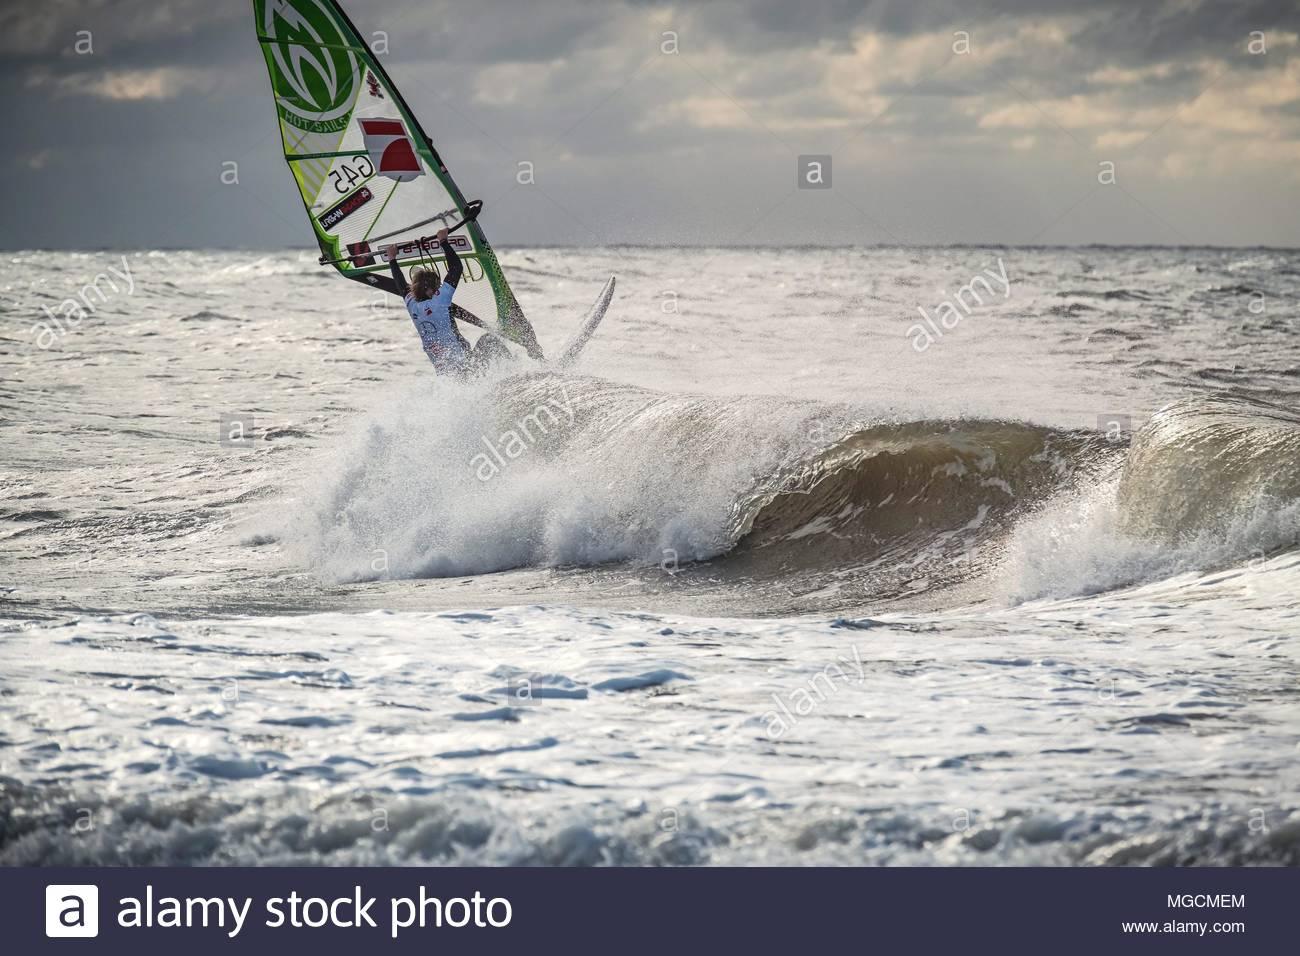 Windsurfworldcup 2016 Sylt Immagini Stock